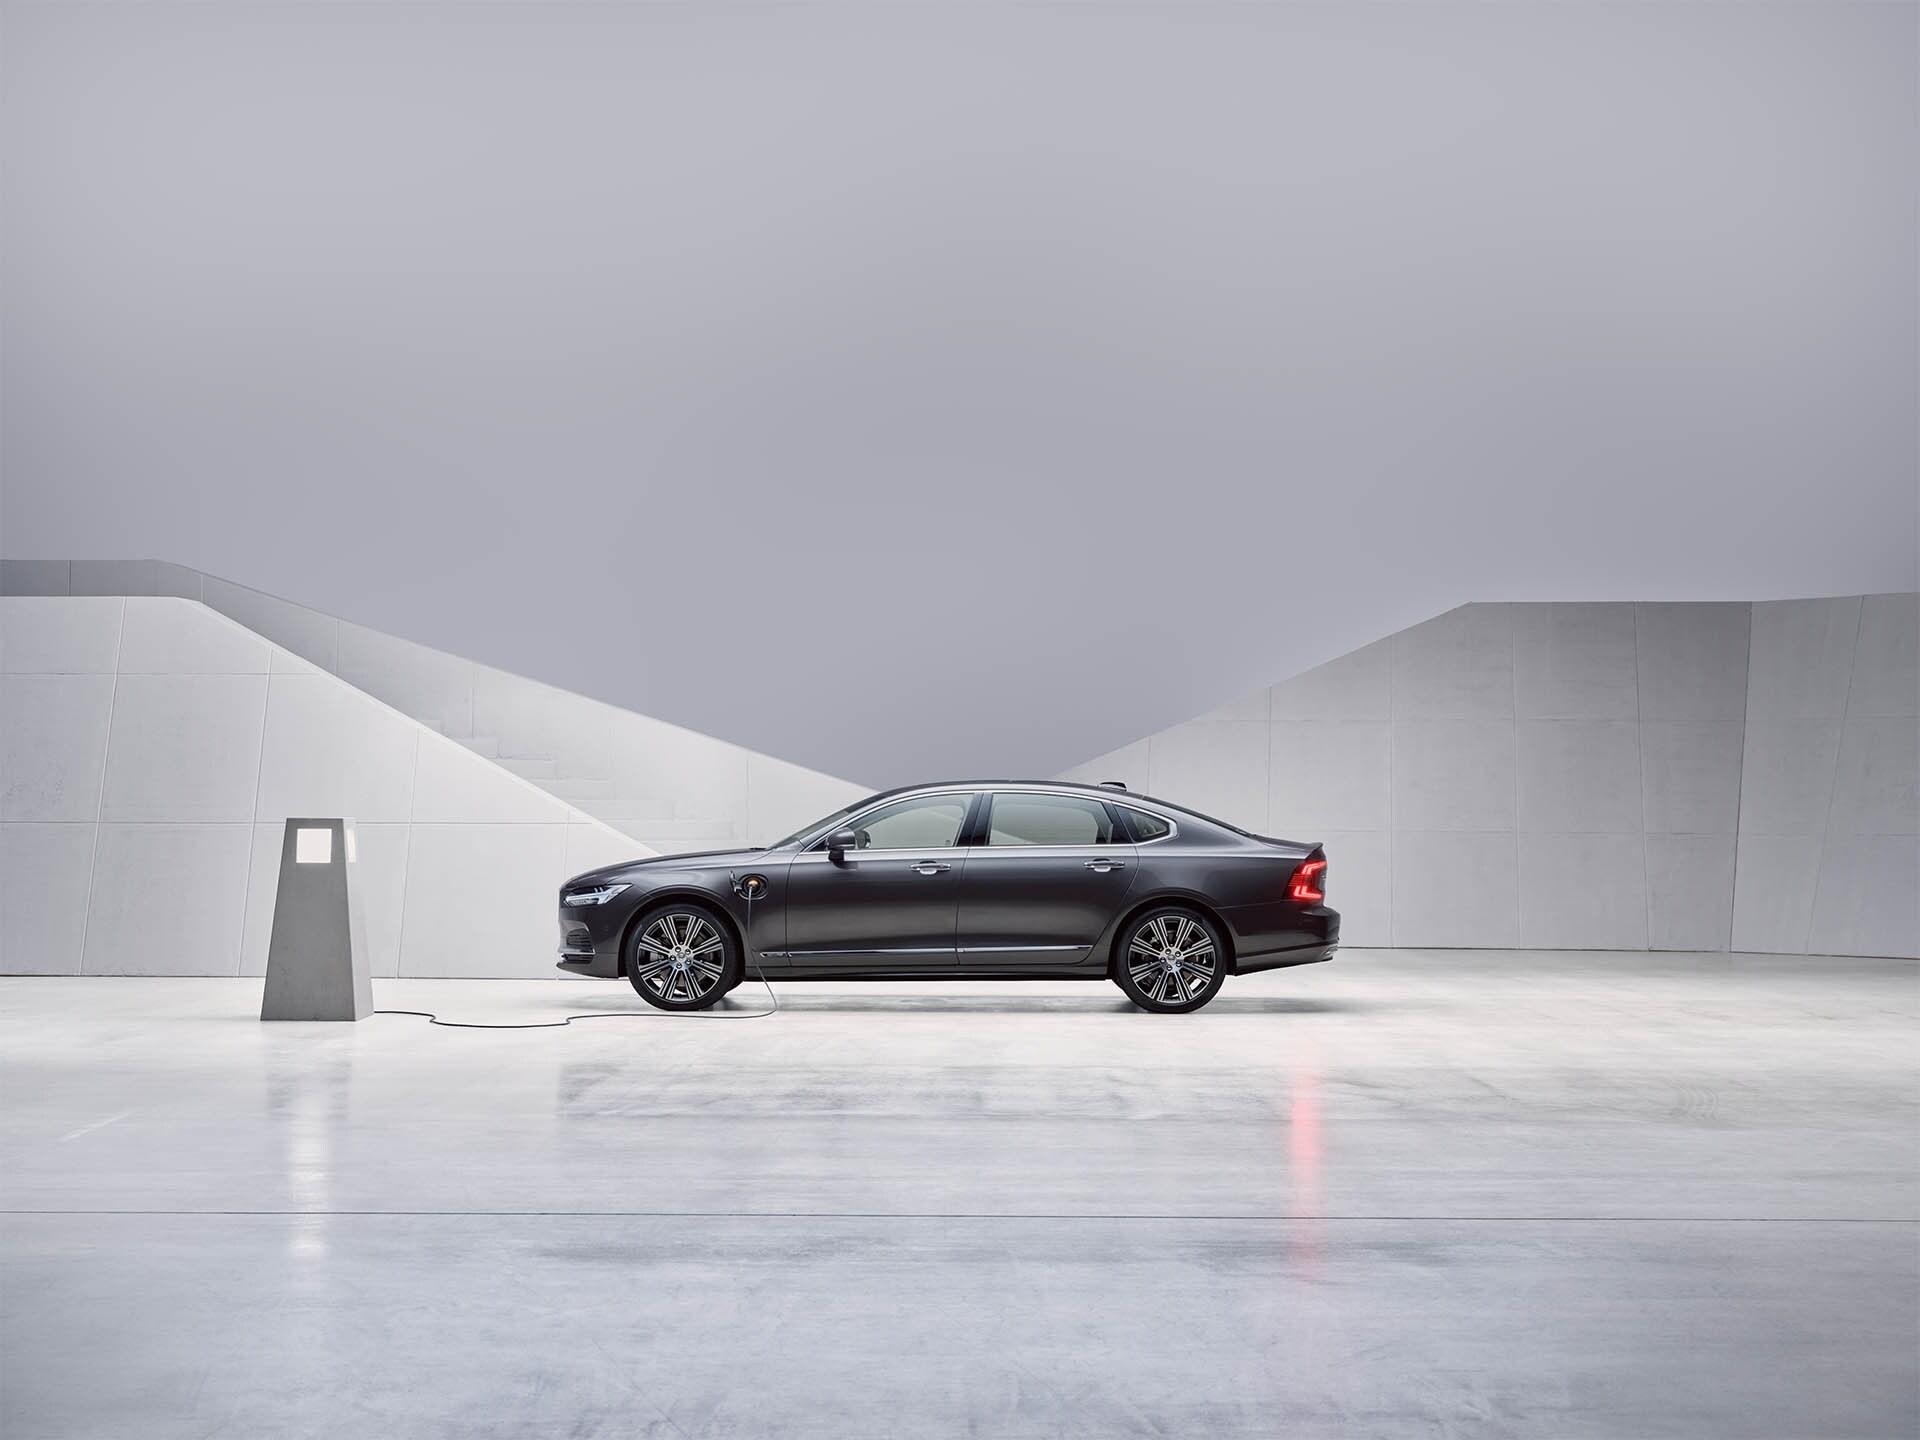 Volvo S90 Plugin Hybrid  สี Pebble Grey จอดนิ่งและกำลังชาร์จไฟอยู่